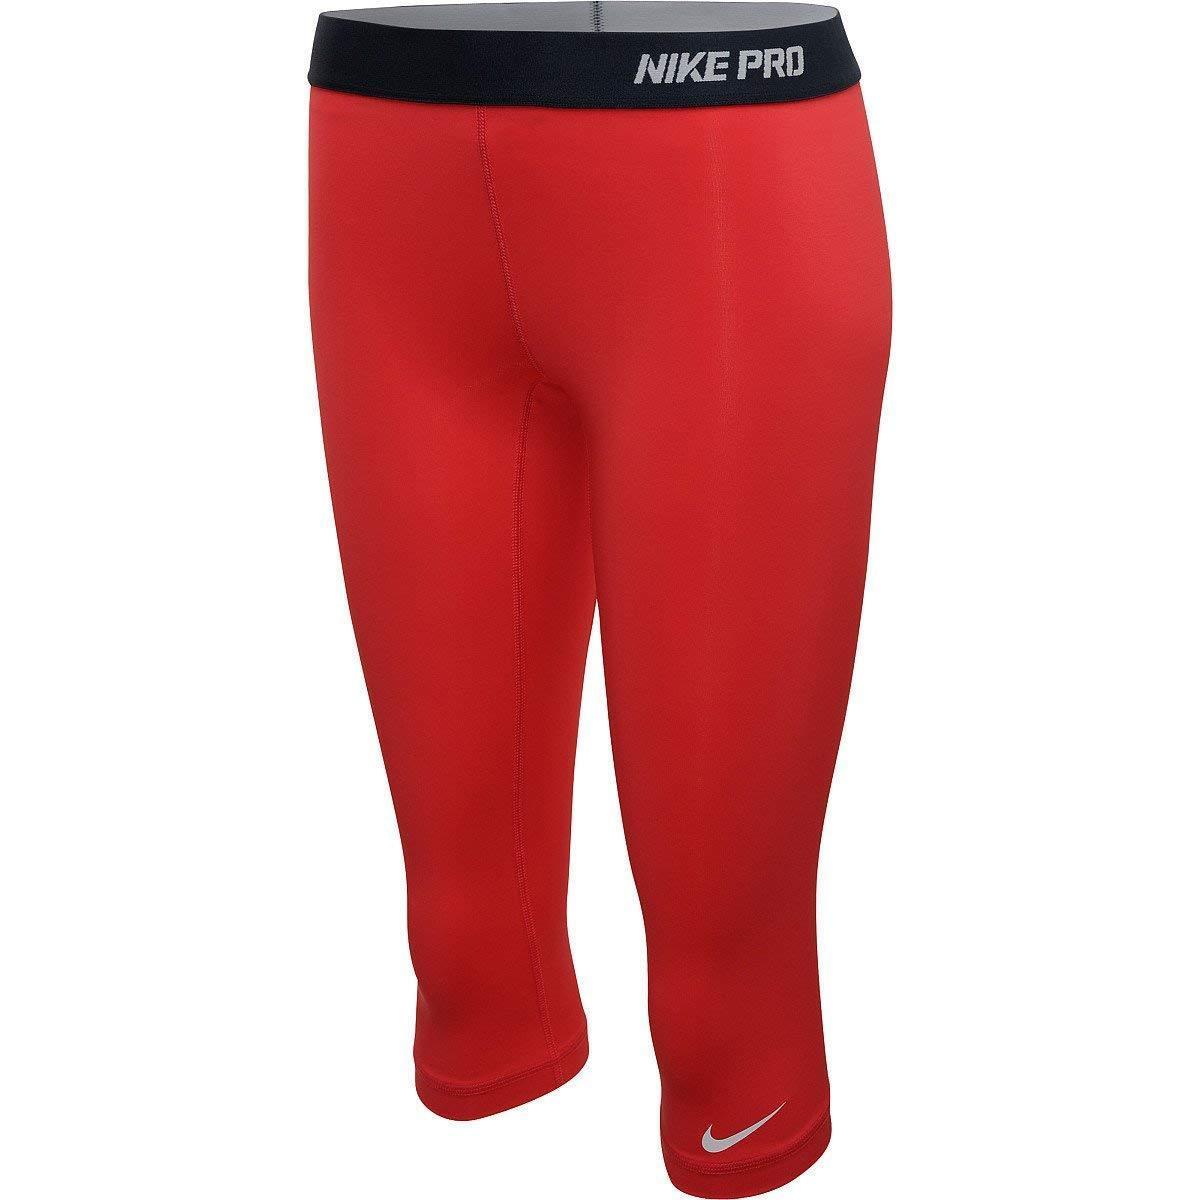 NEW  FUSION RED [S] NIKE PRO Women's Capri Tights Pants DRI-FIT SMALL